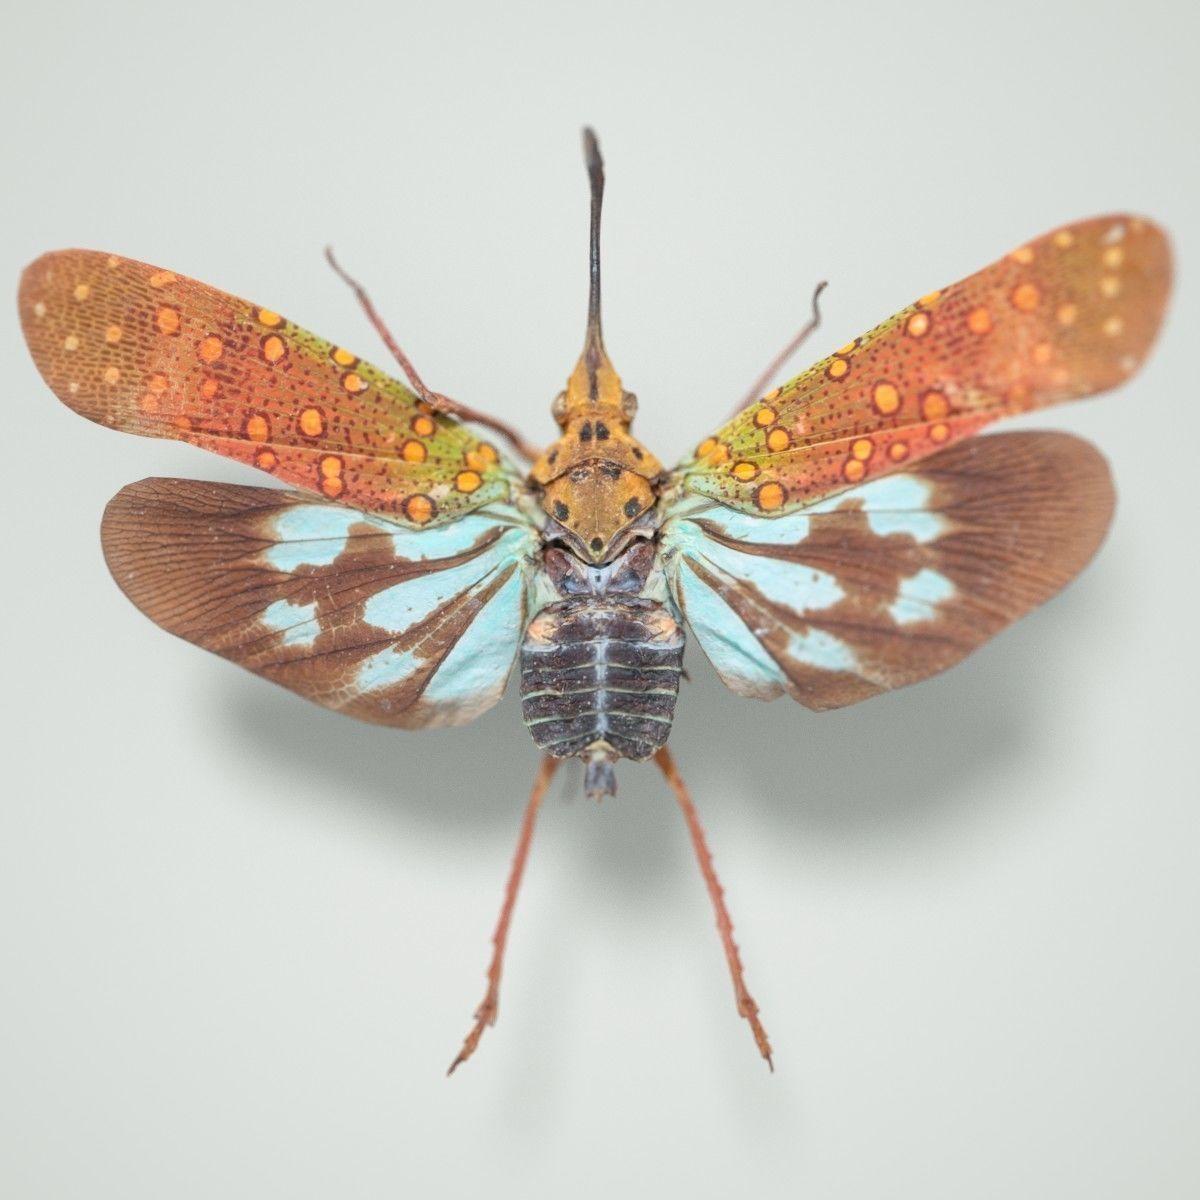 Cicada Saiva Gemmata Laos Insect